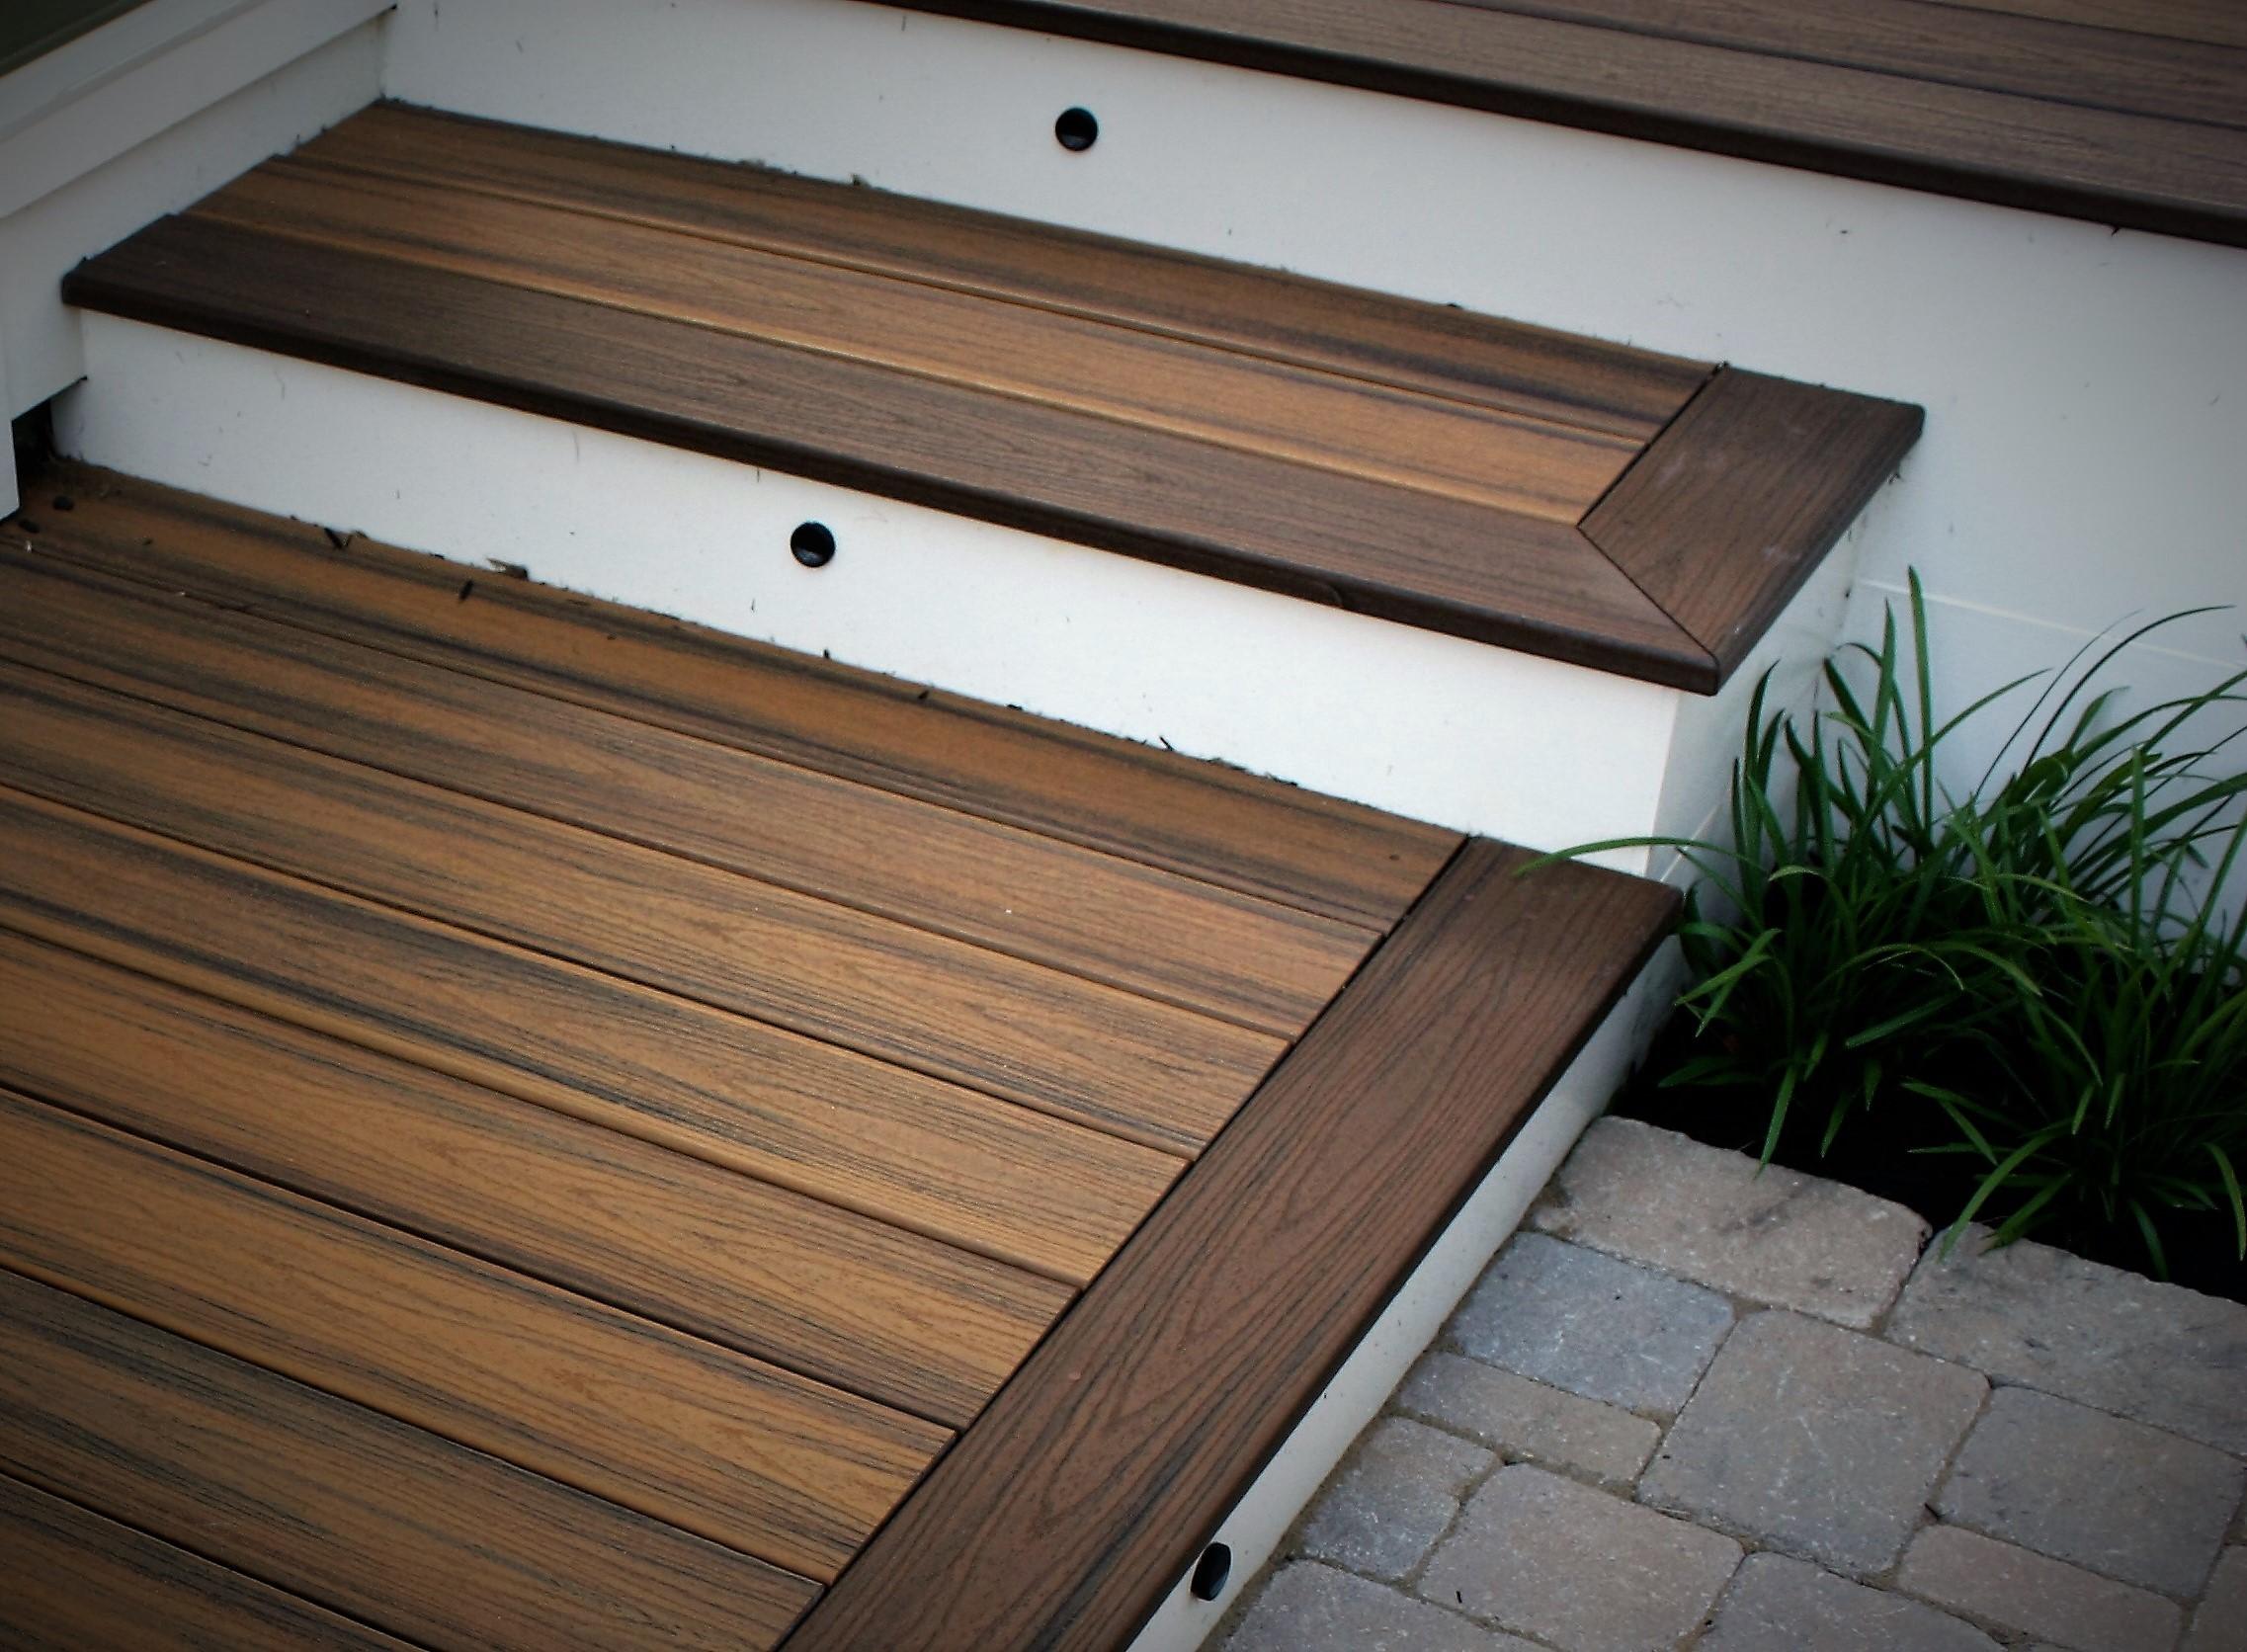 2017 Decking parison Trex Deck Boards Vs Wood